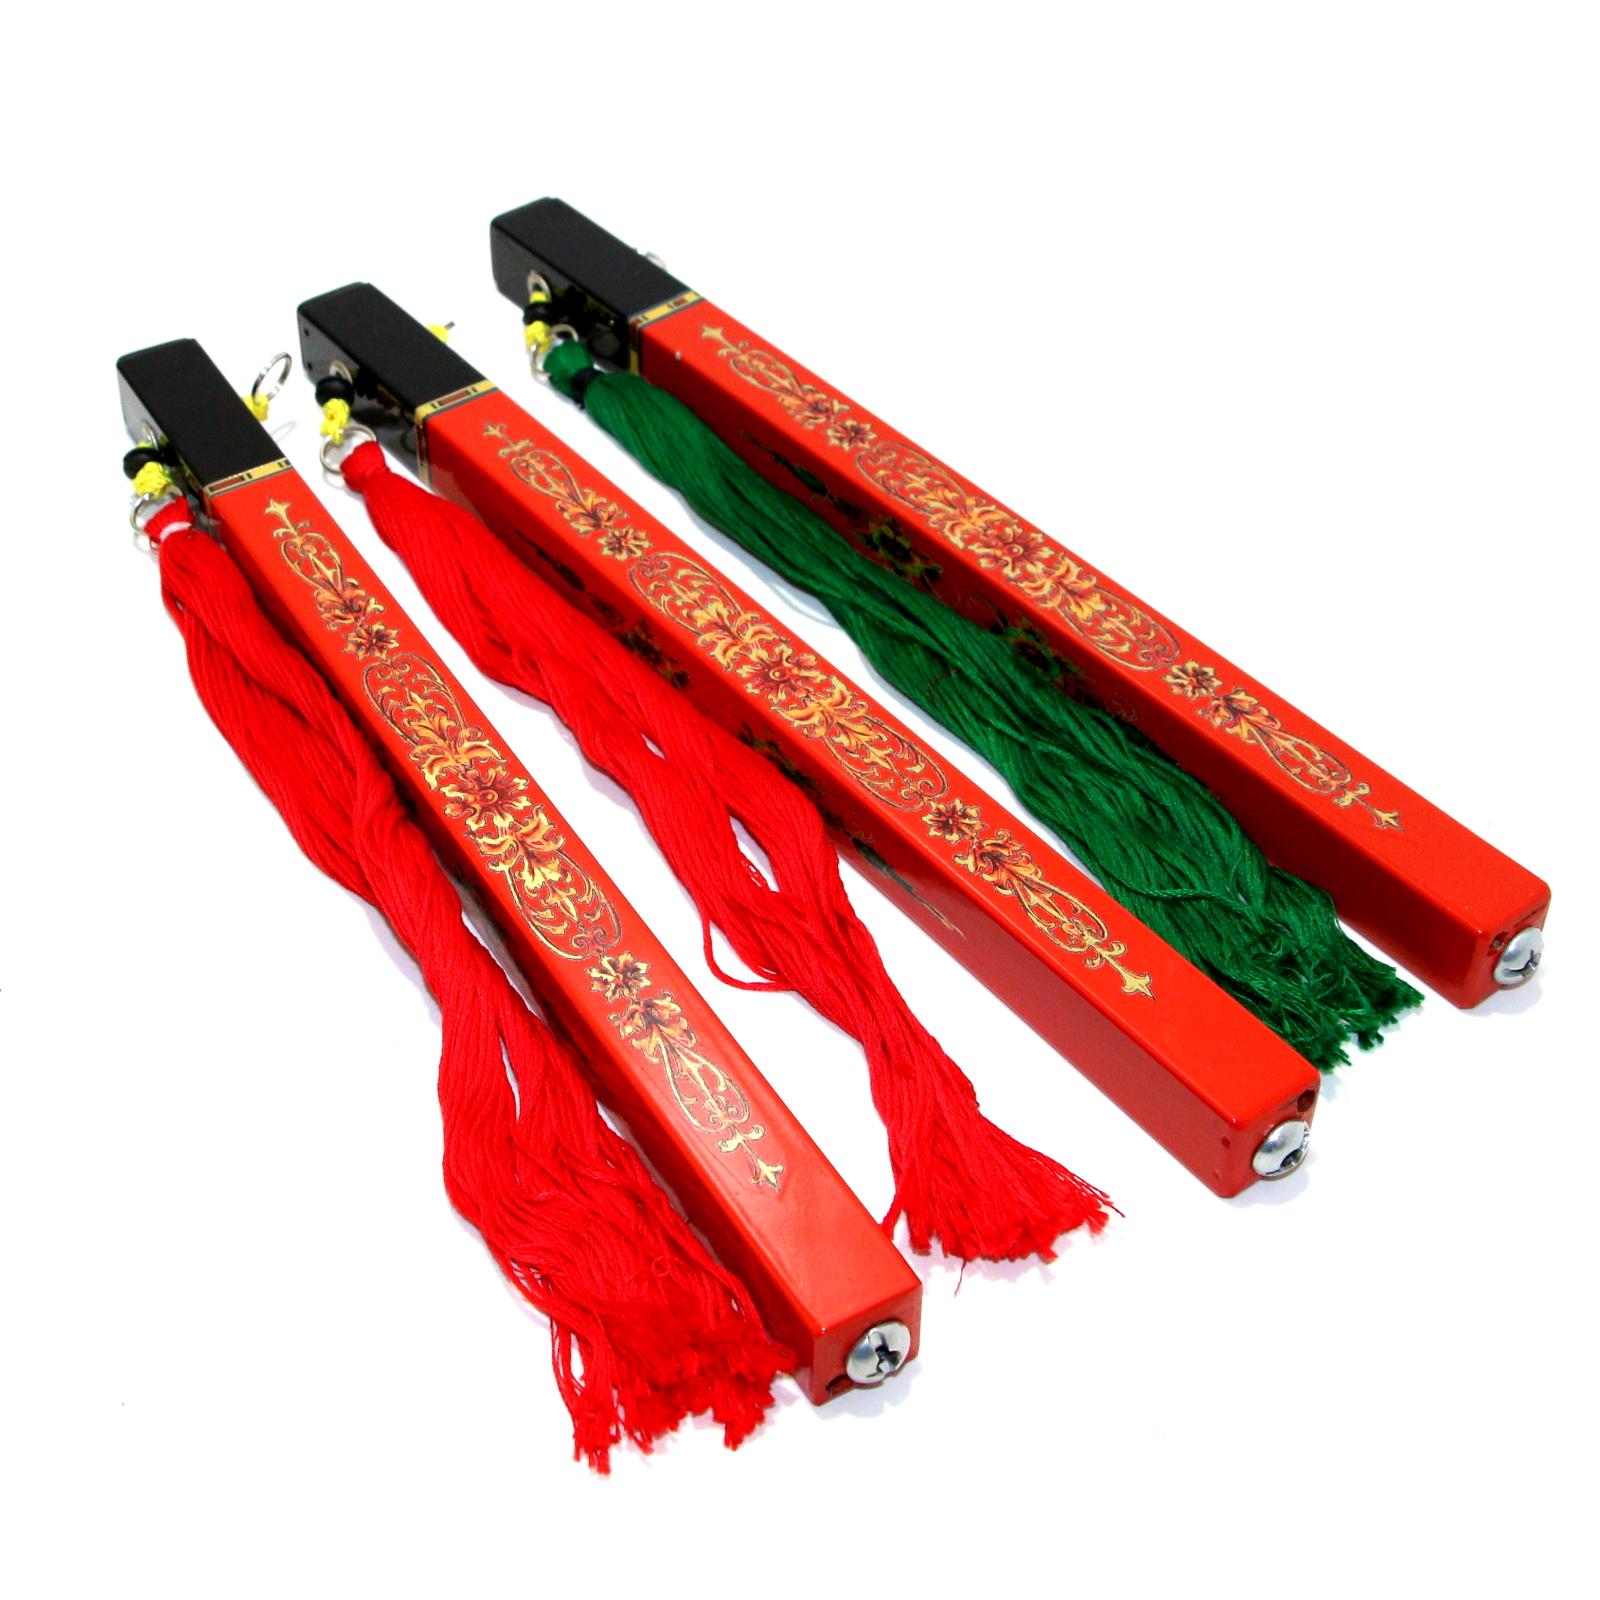 Chinese Sticks by George Millward, Nielsen Magic